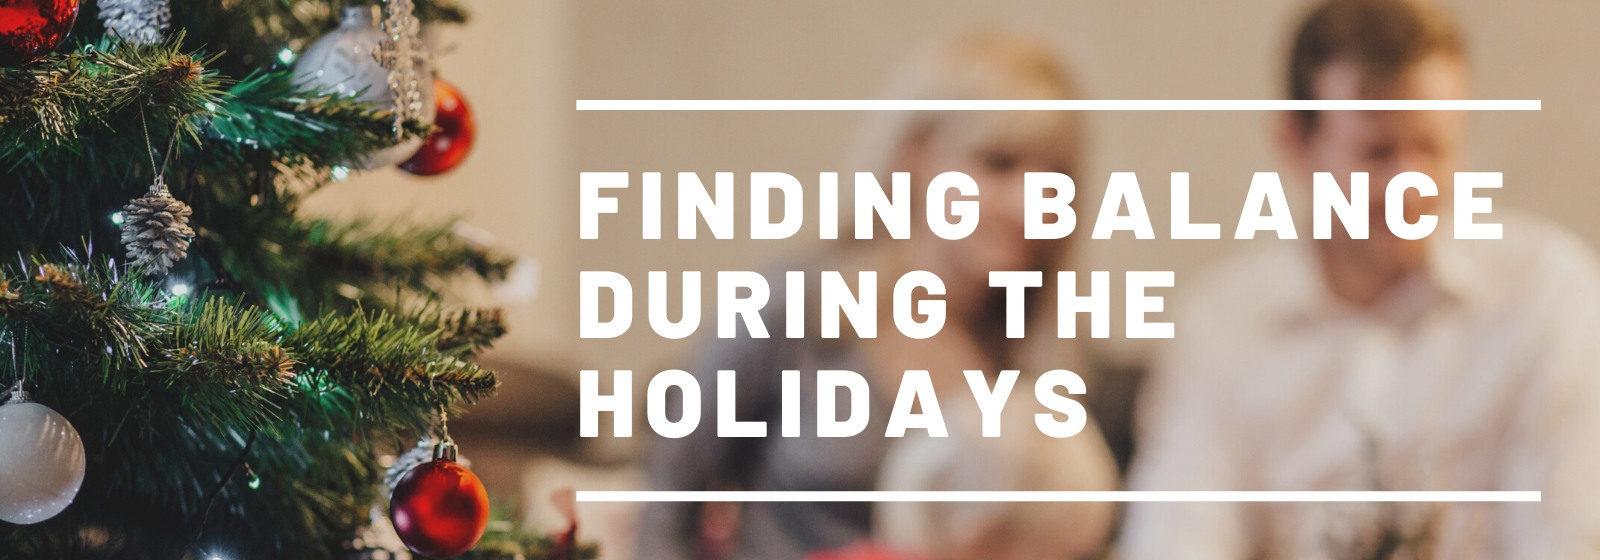 holiday season finding balance